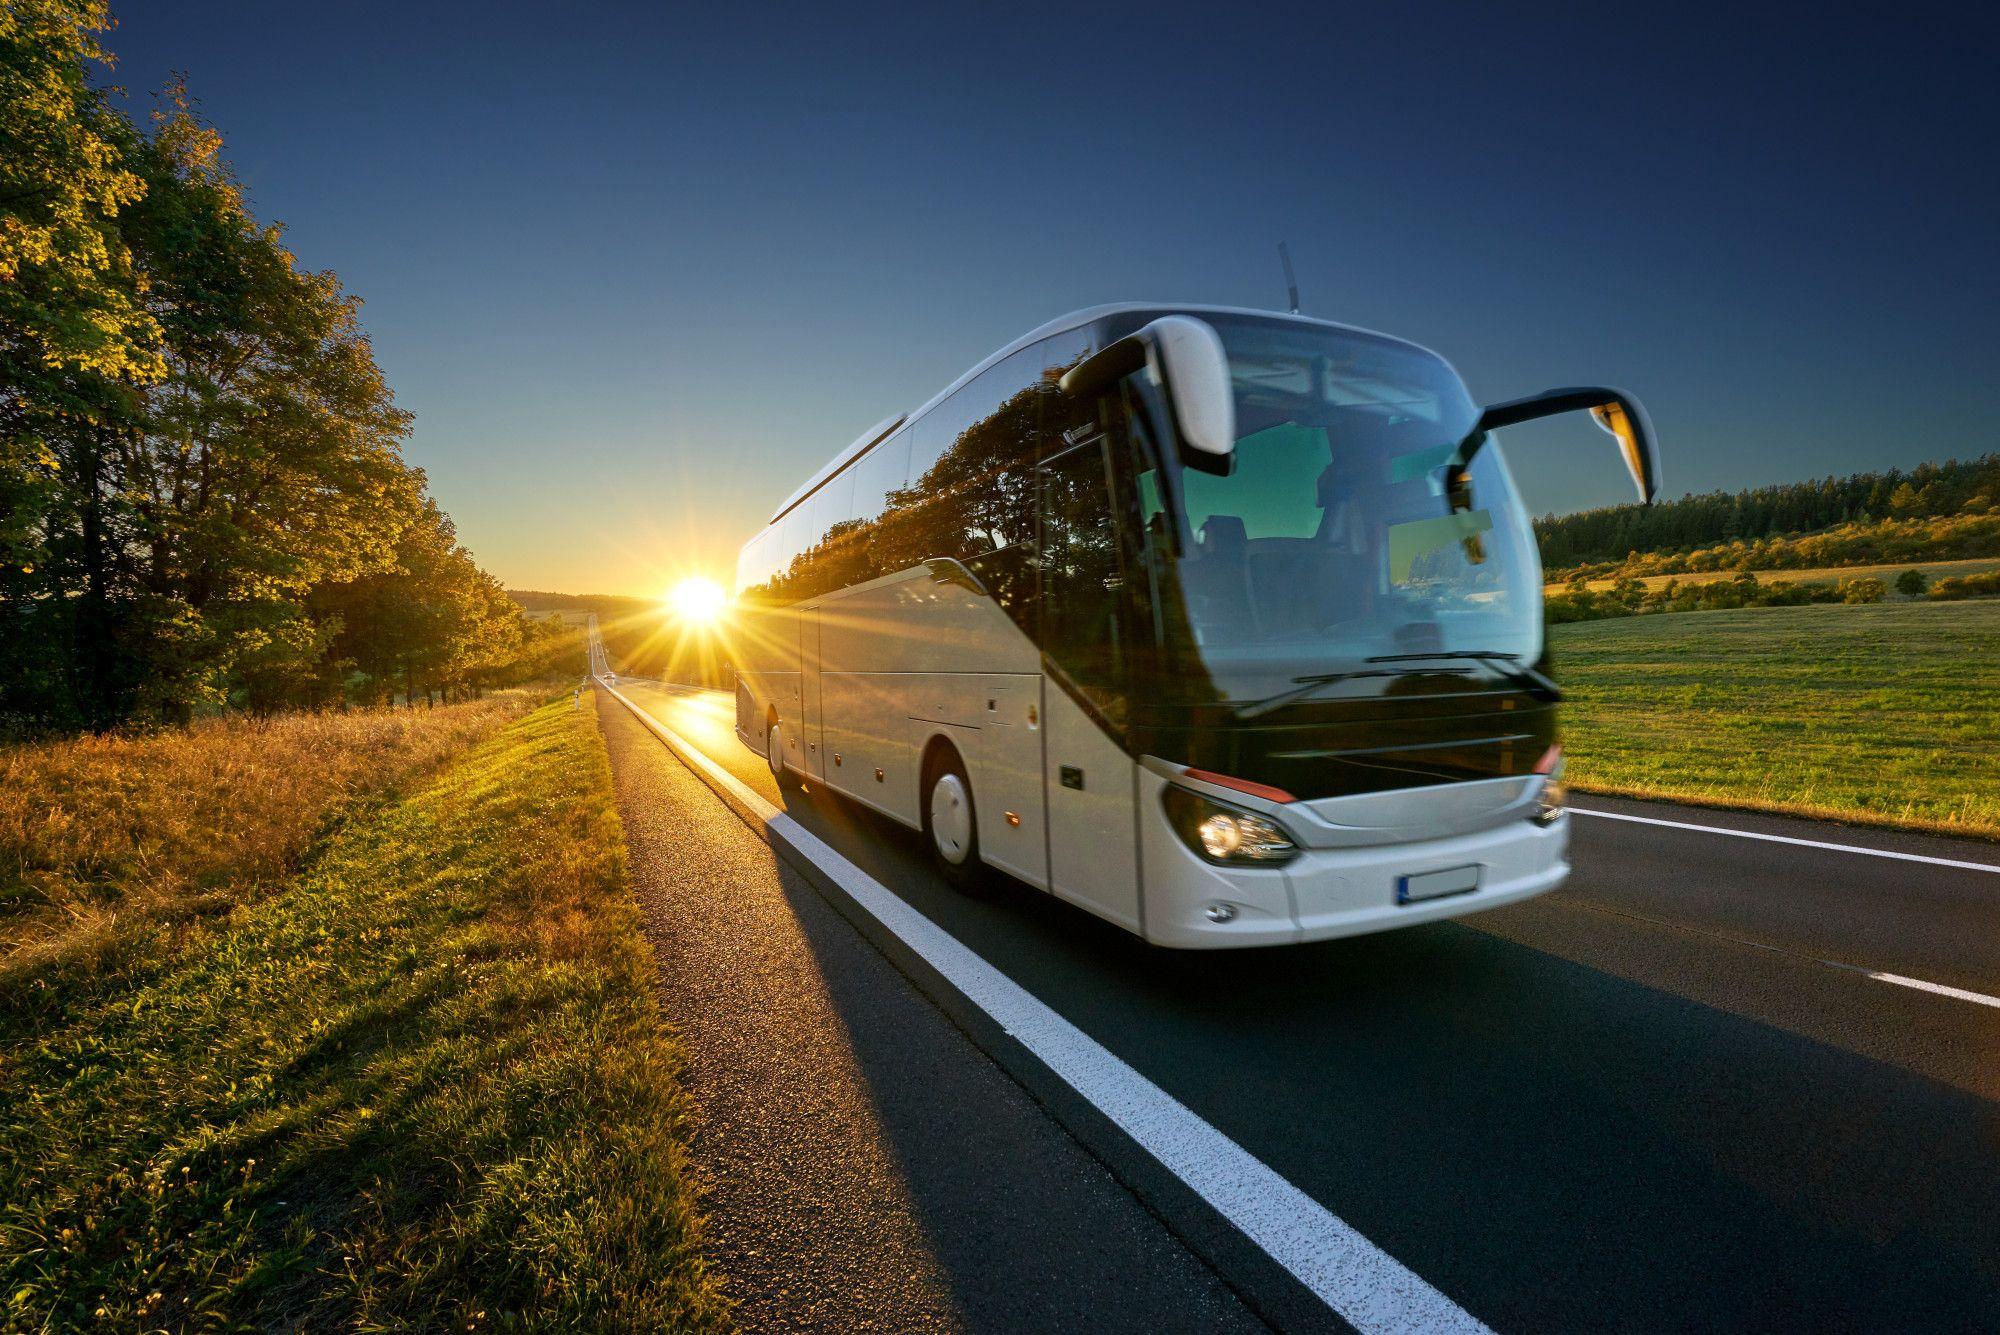 autobus 3146